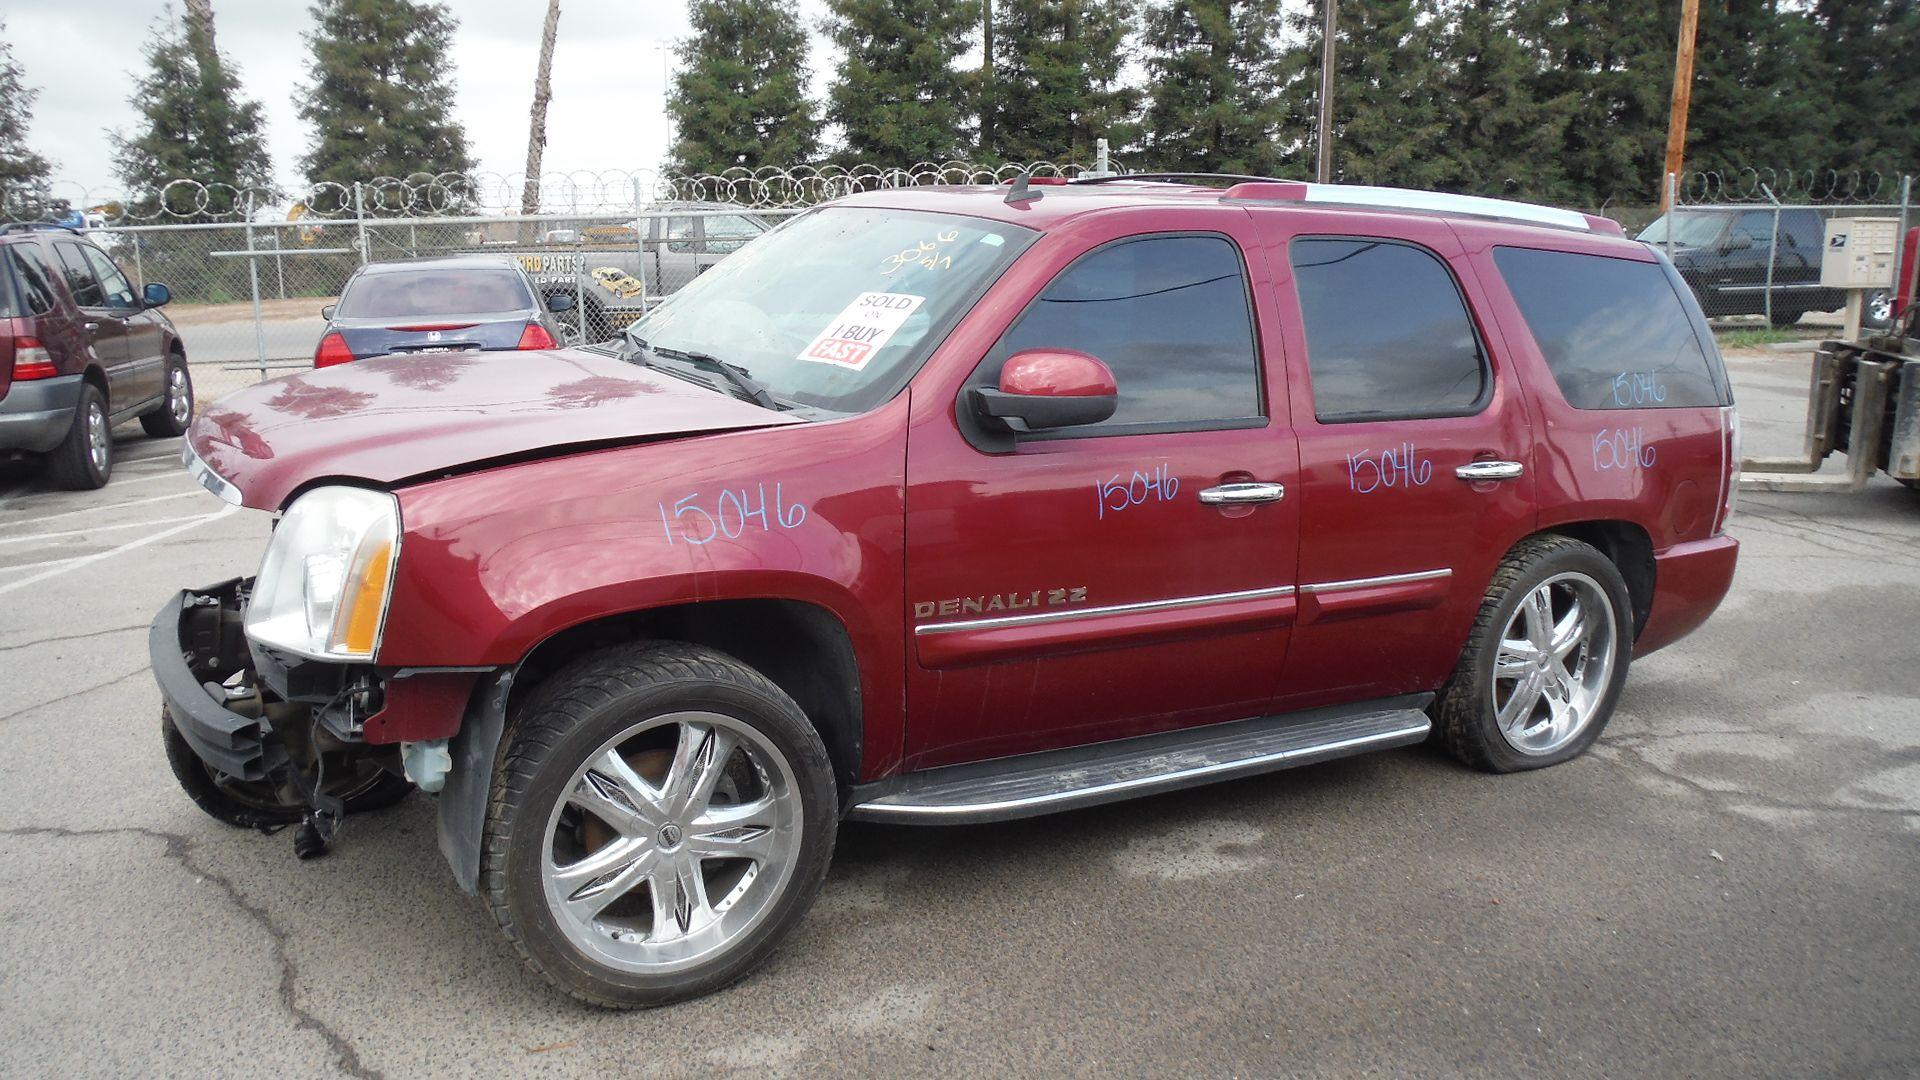 Callaway Cars Usa On Twitter Callaway Cars Black Tahoe Chevy Trucks